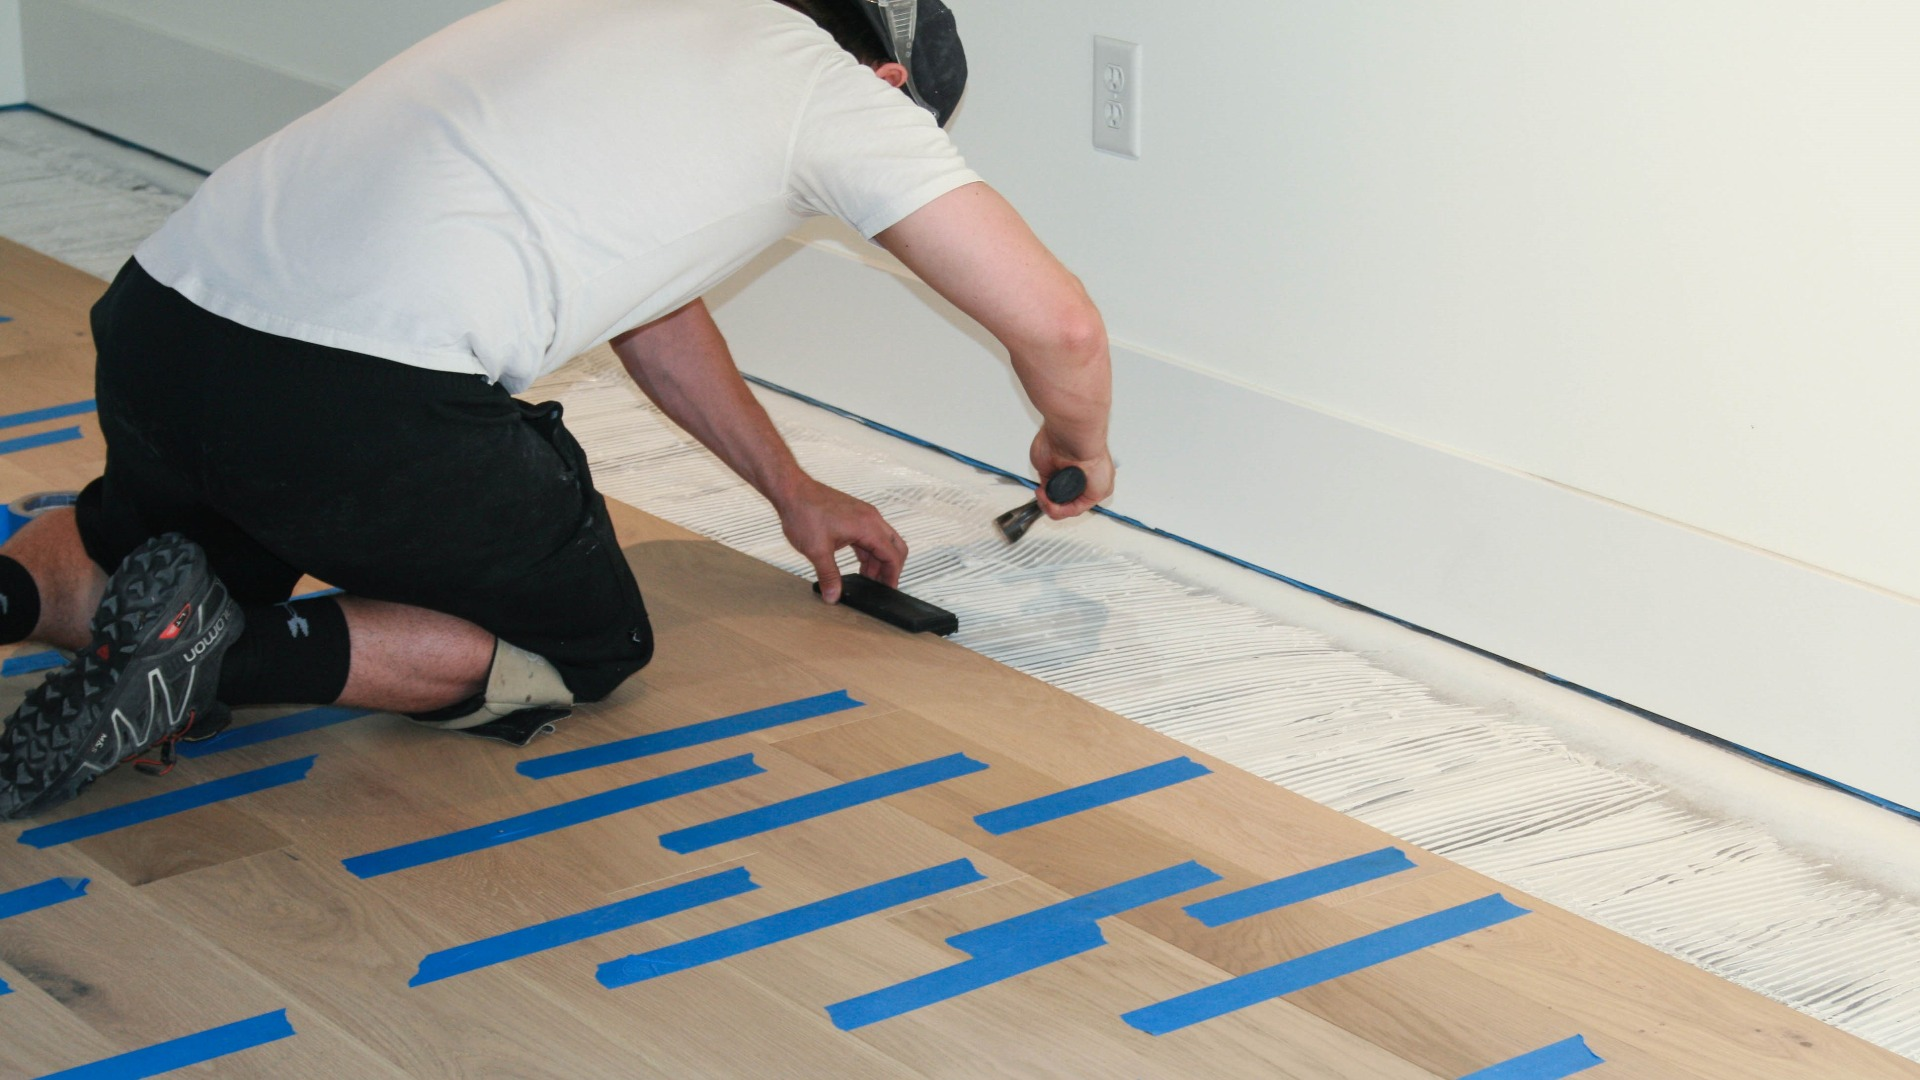 Glue Down Install